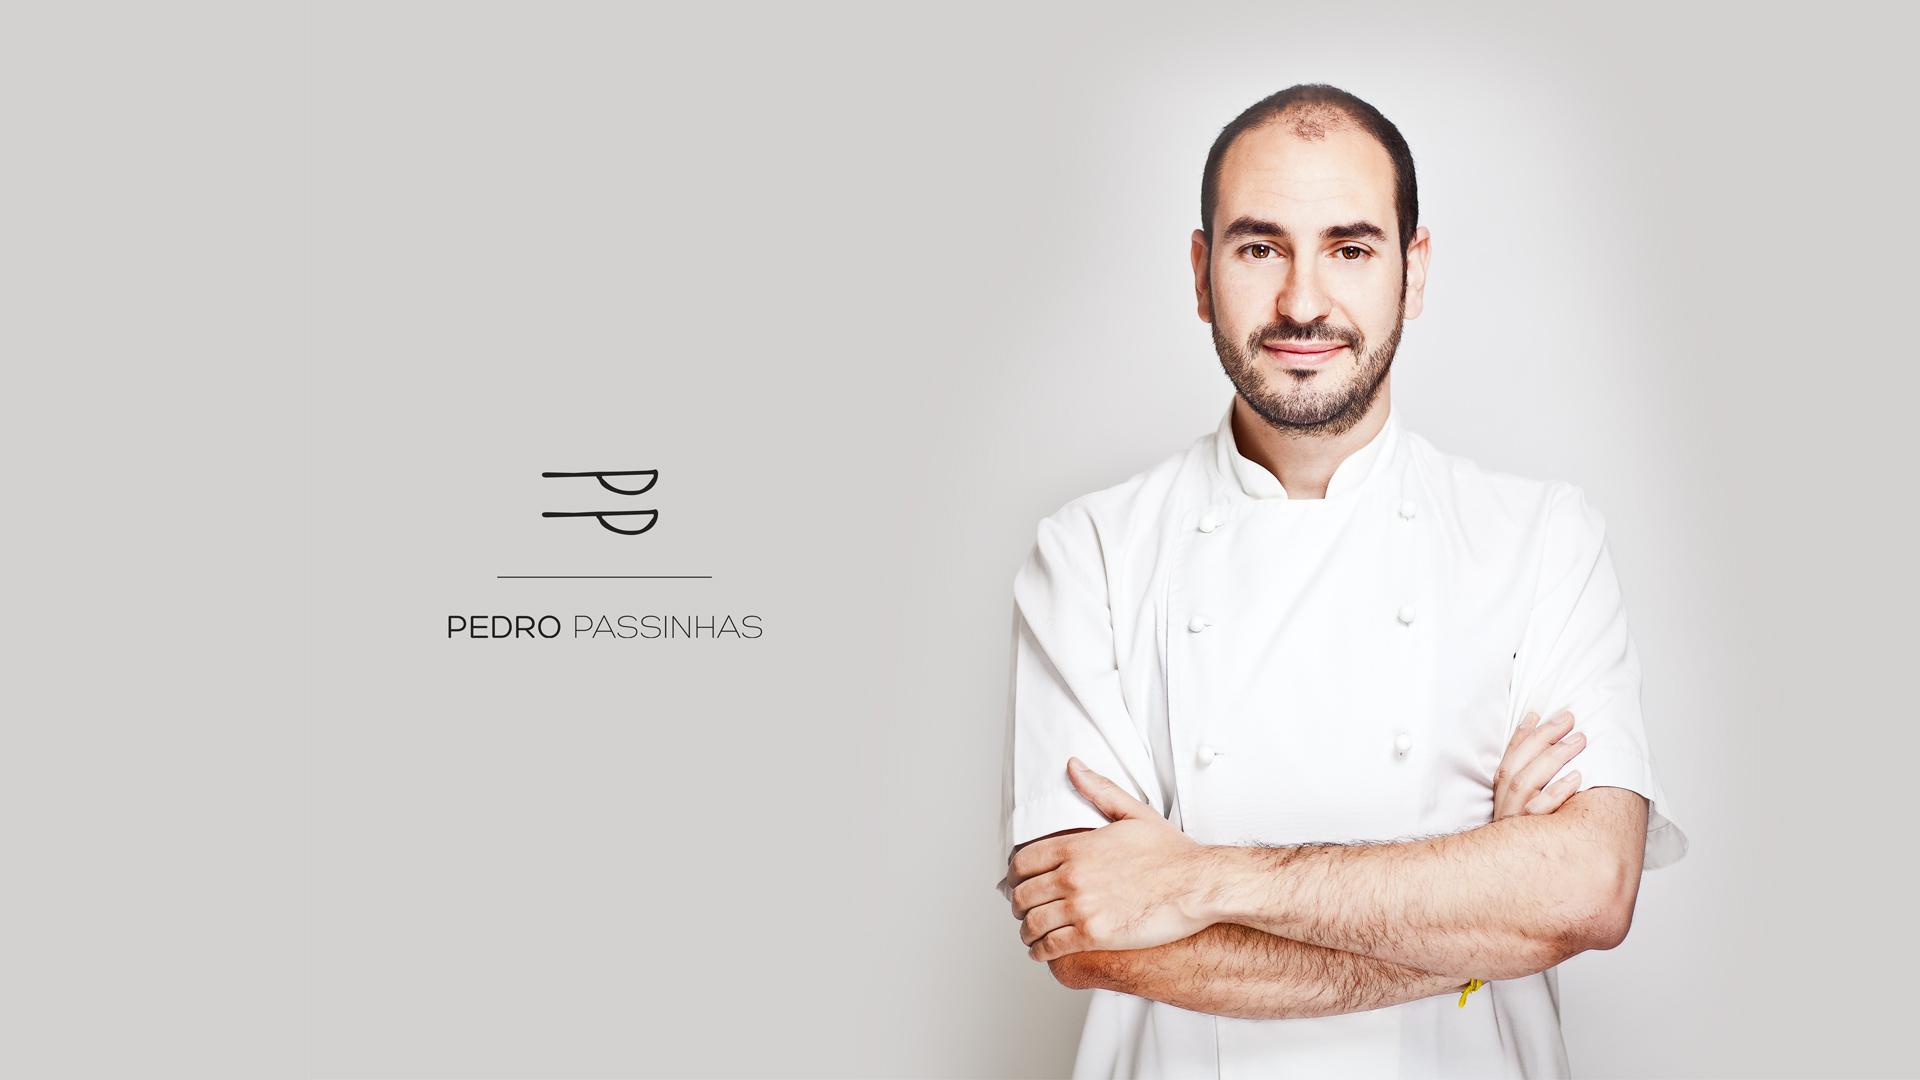 Pedro Passinhas